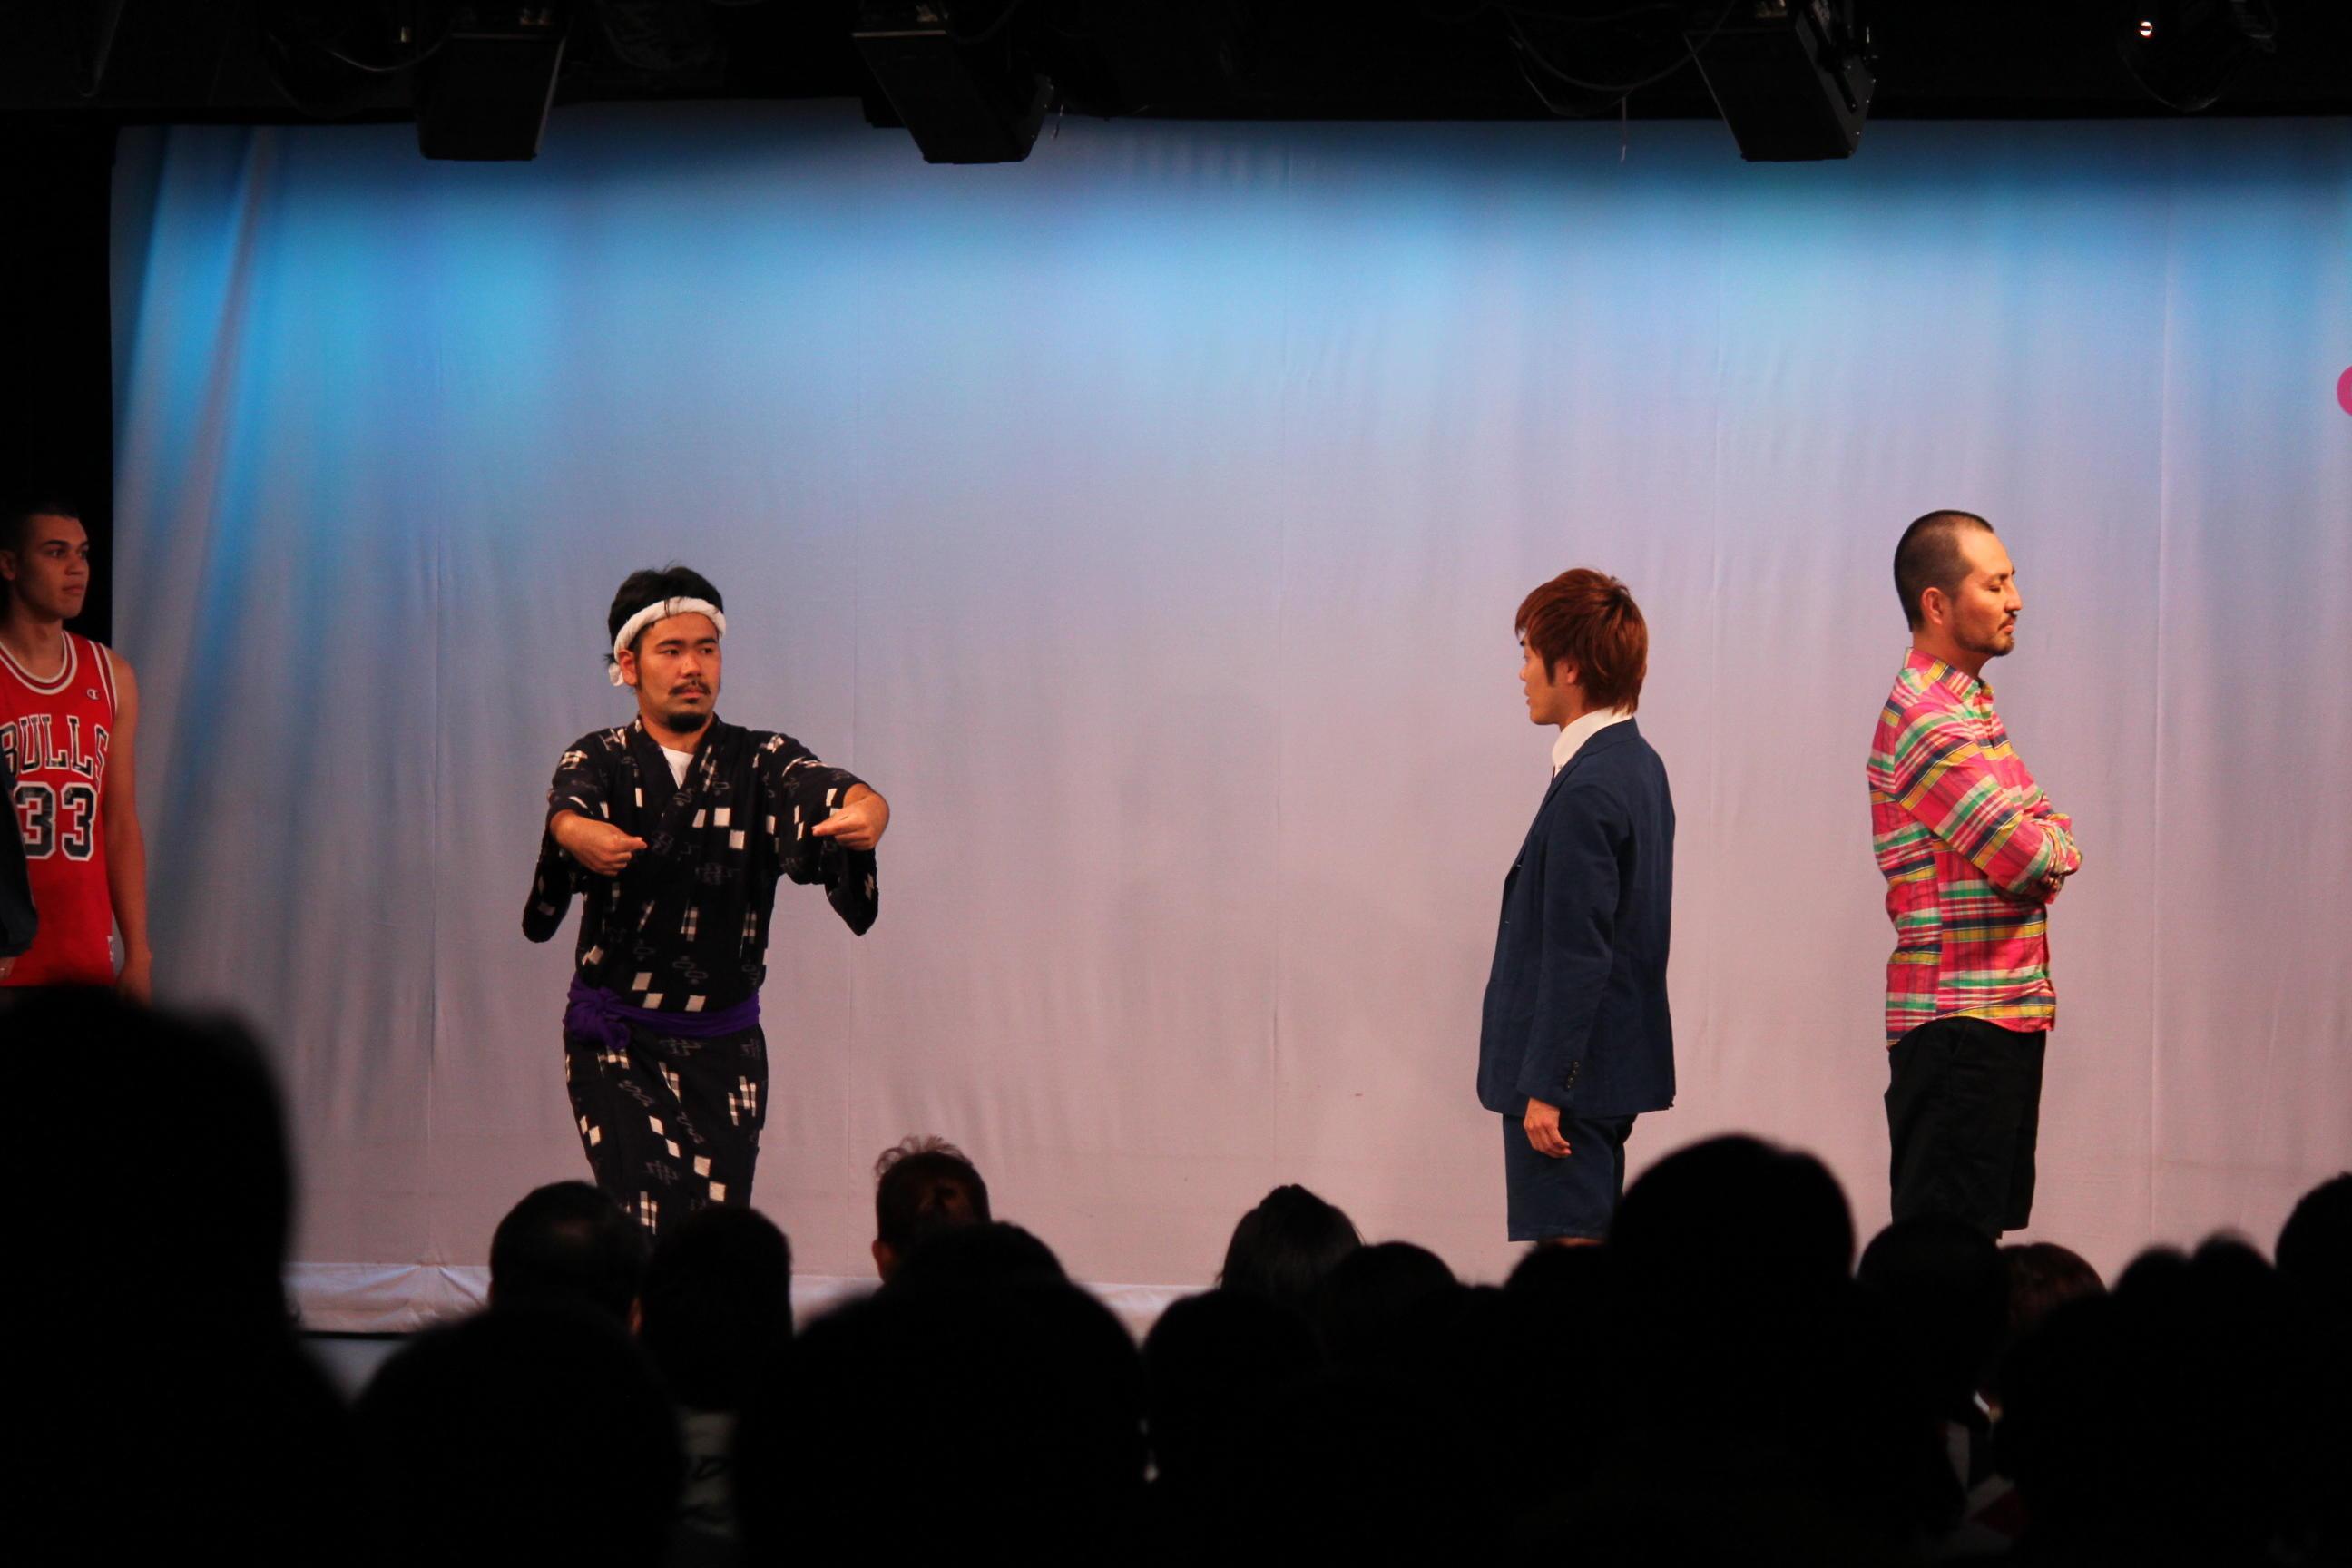 http://news.yoshimoto.co.jp/20161018173001-9fbb7475e2972dc16e89260d2726b5cdbe430371.jpg